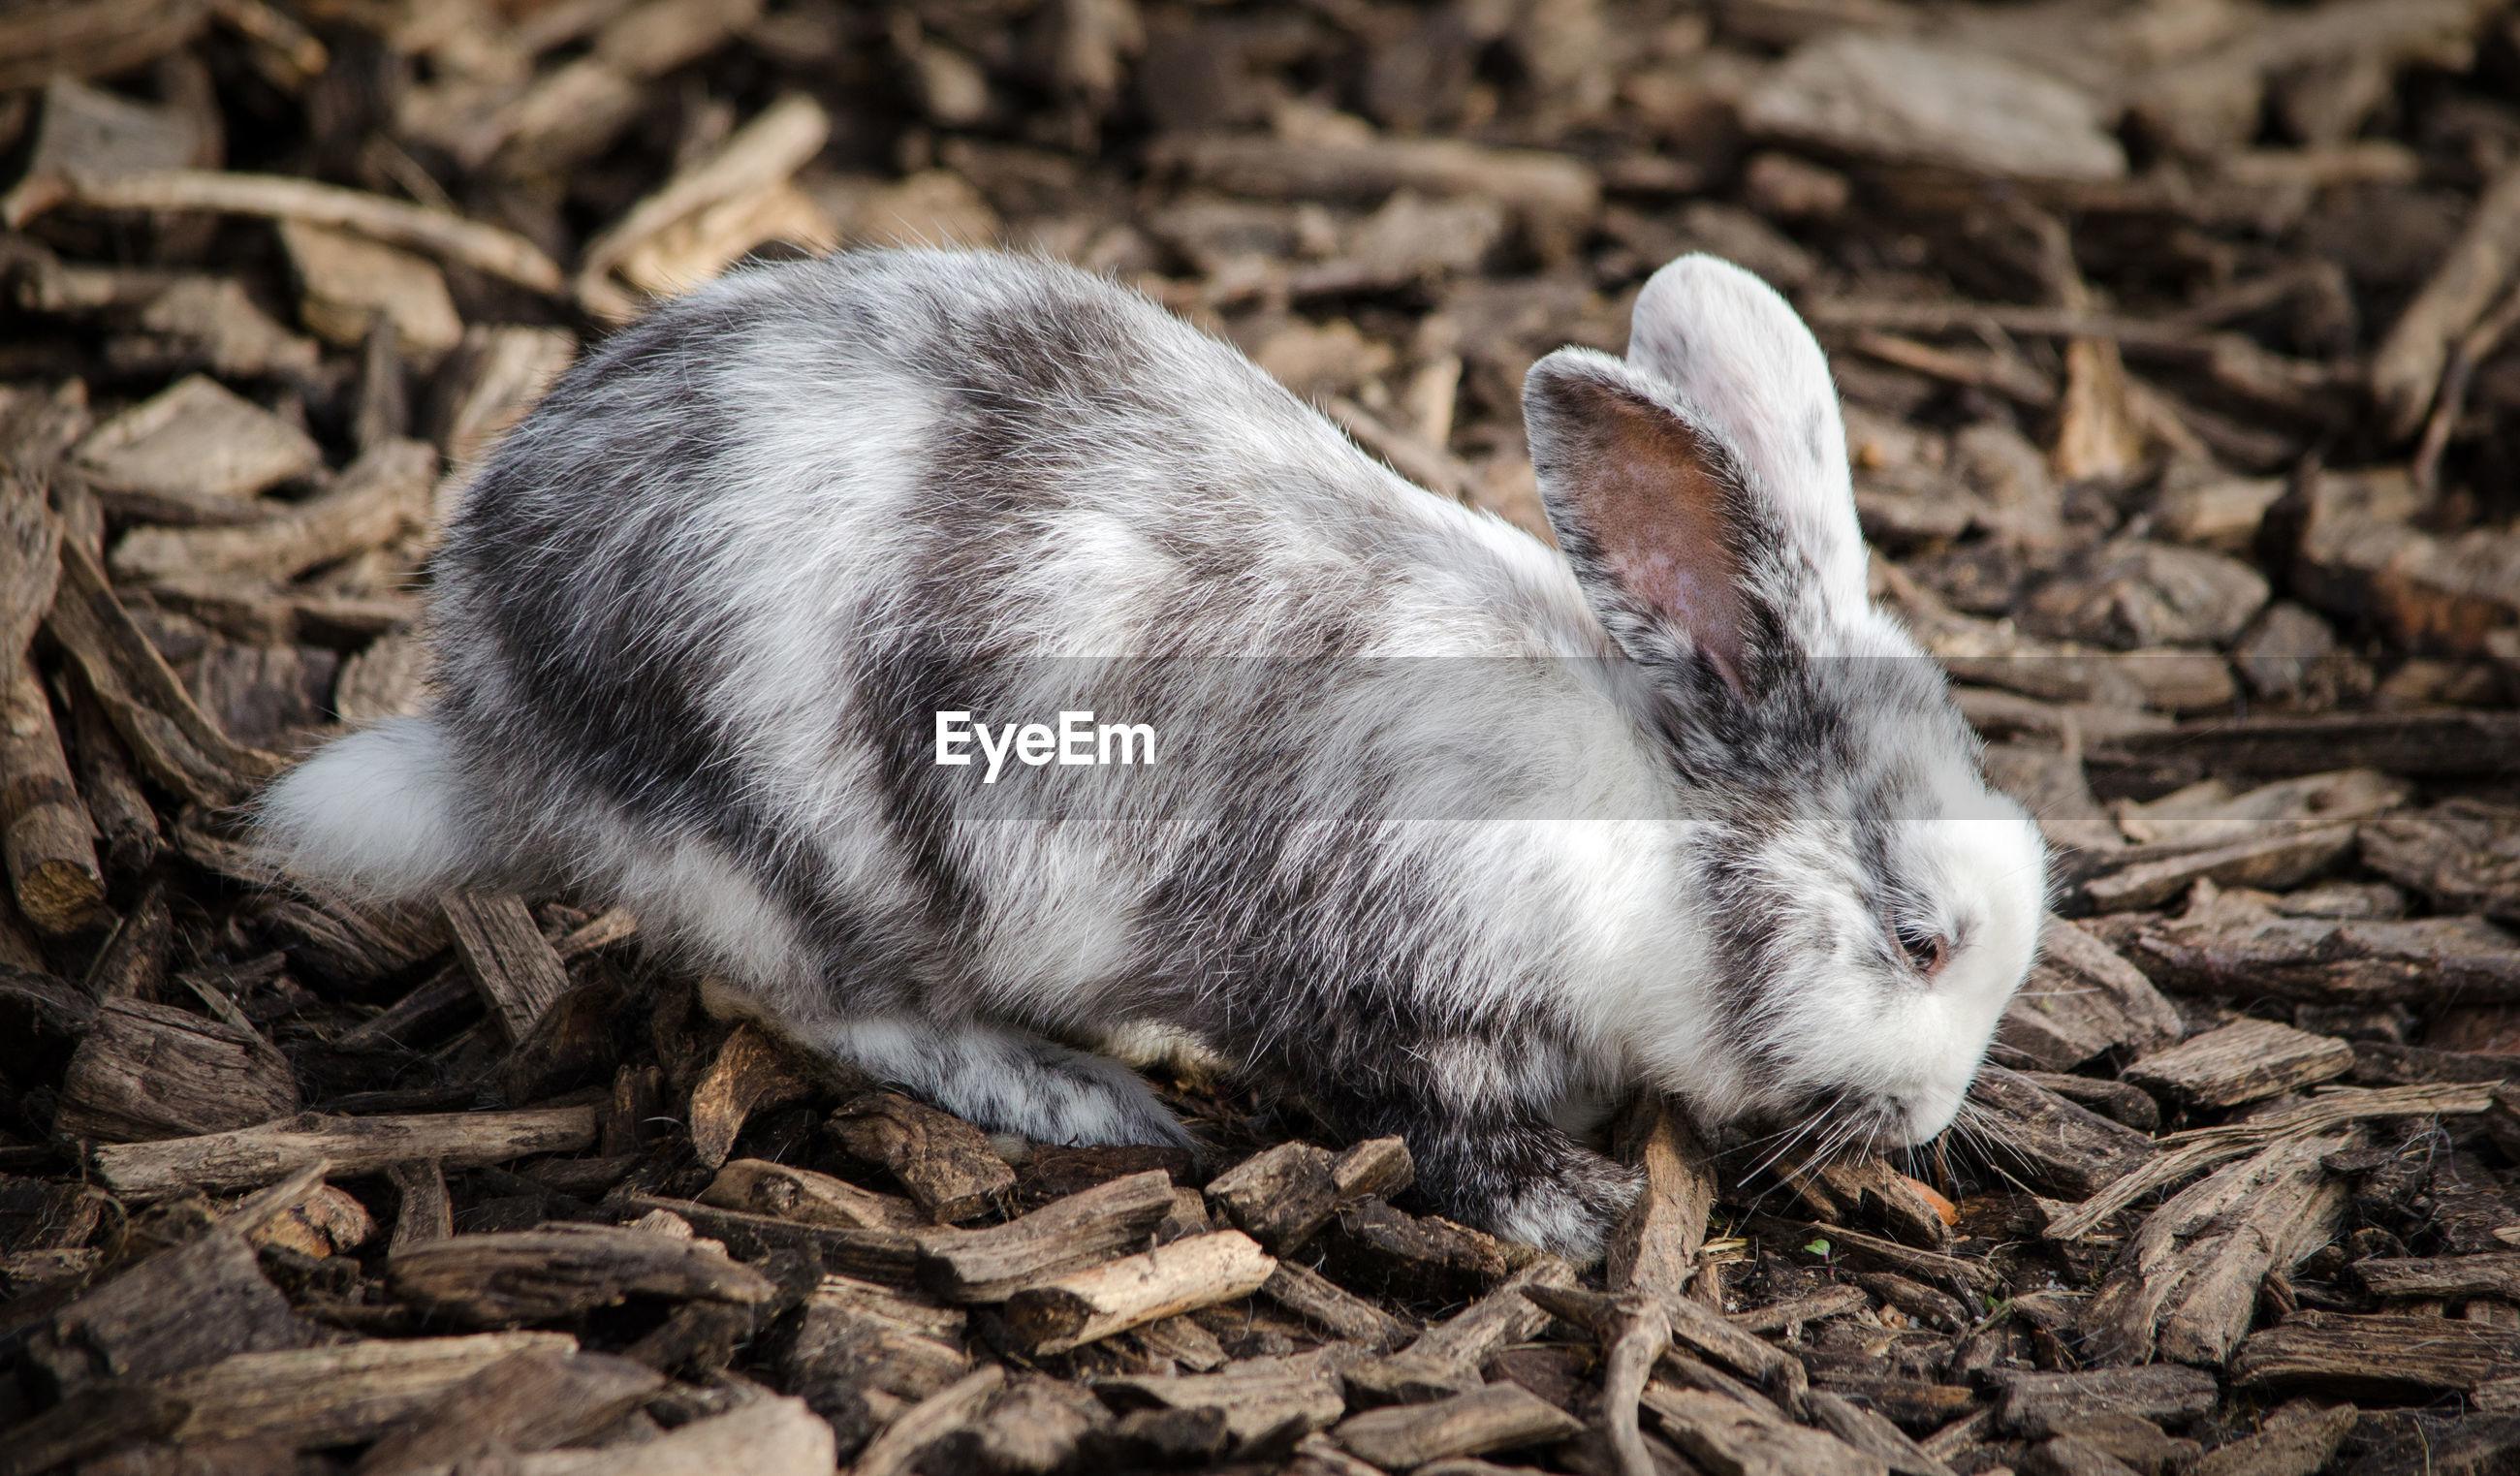 Rabbit on wood chips